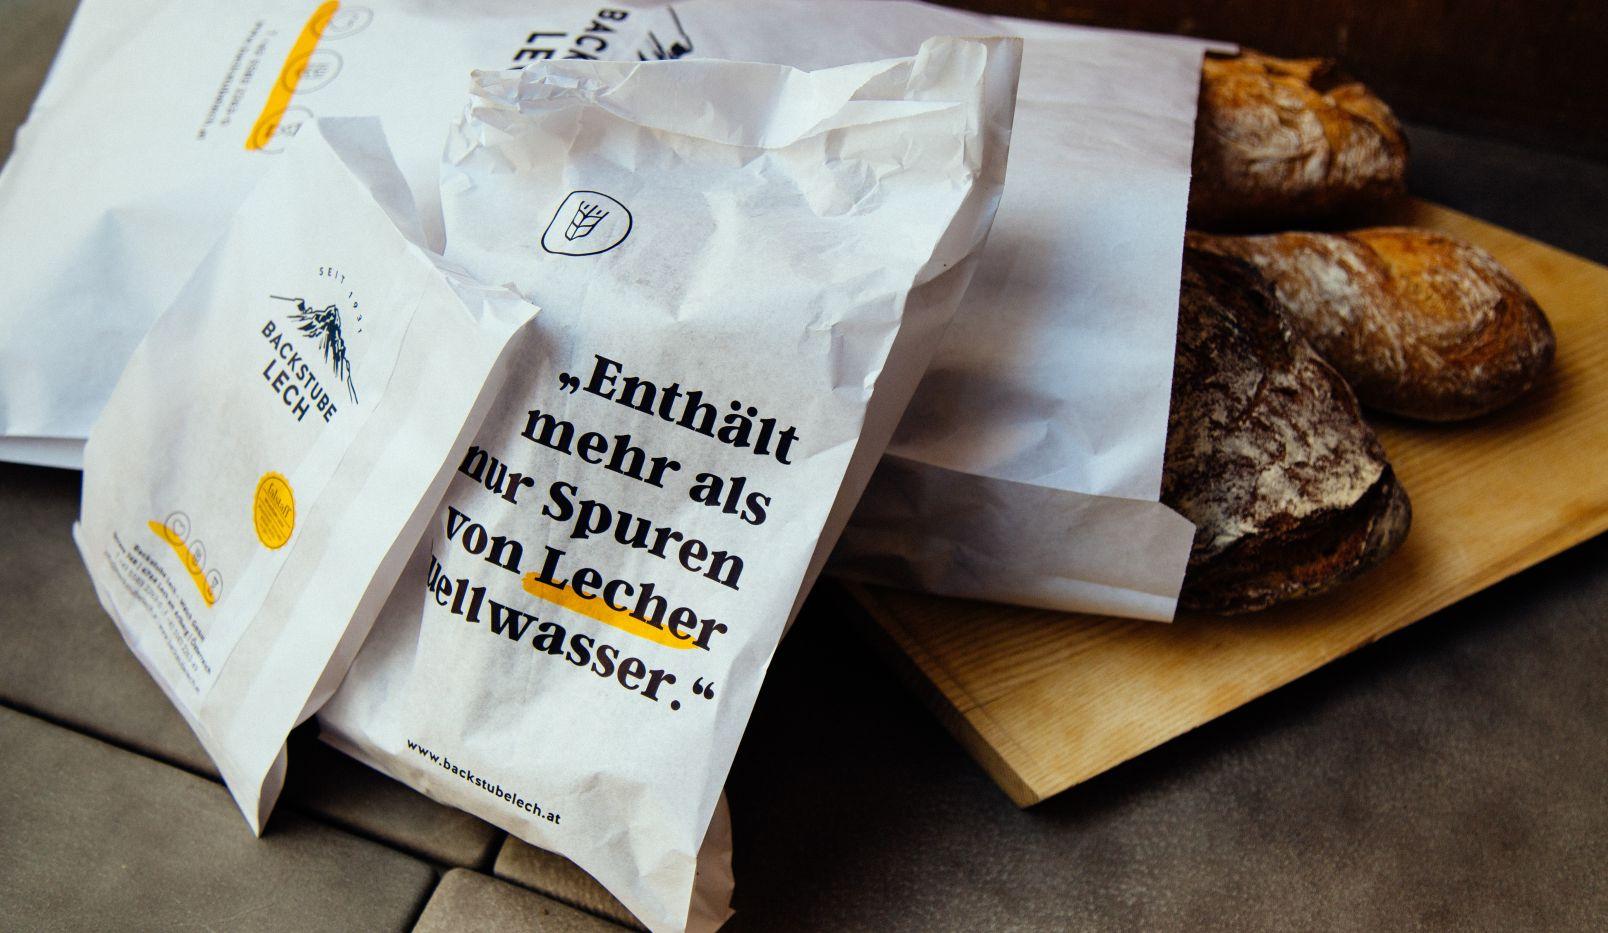 Backstube Lech